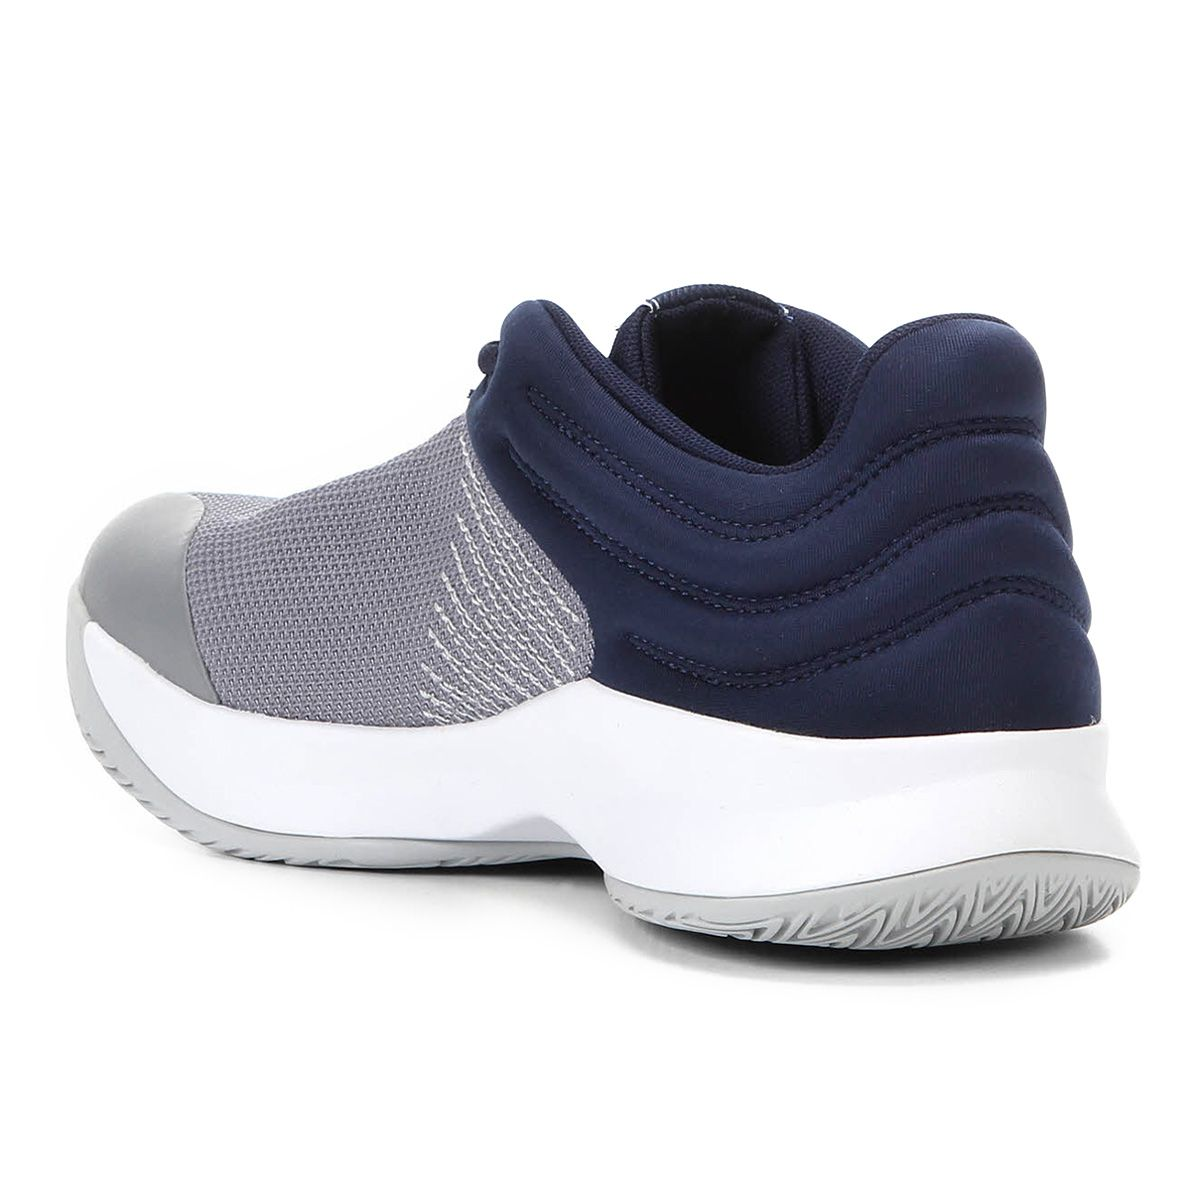 Tênis Adidas Pro Spark 2018 Low Masculino - Cinza/Azul